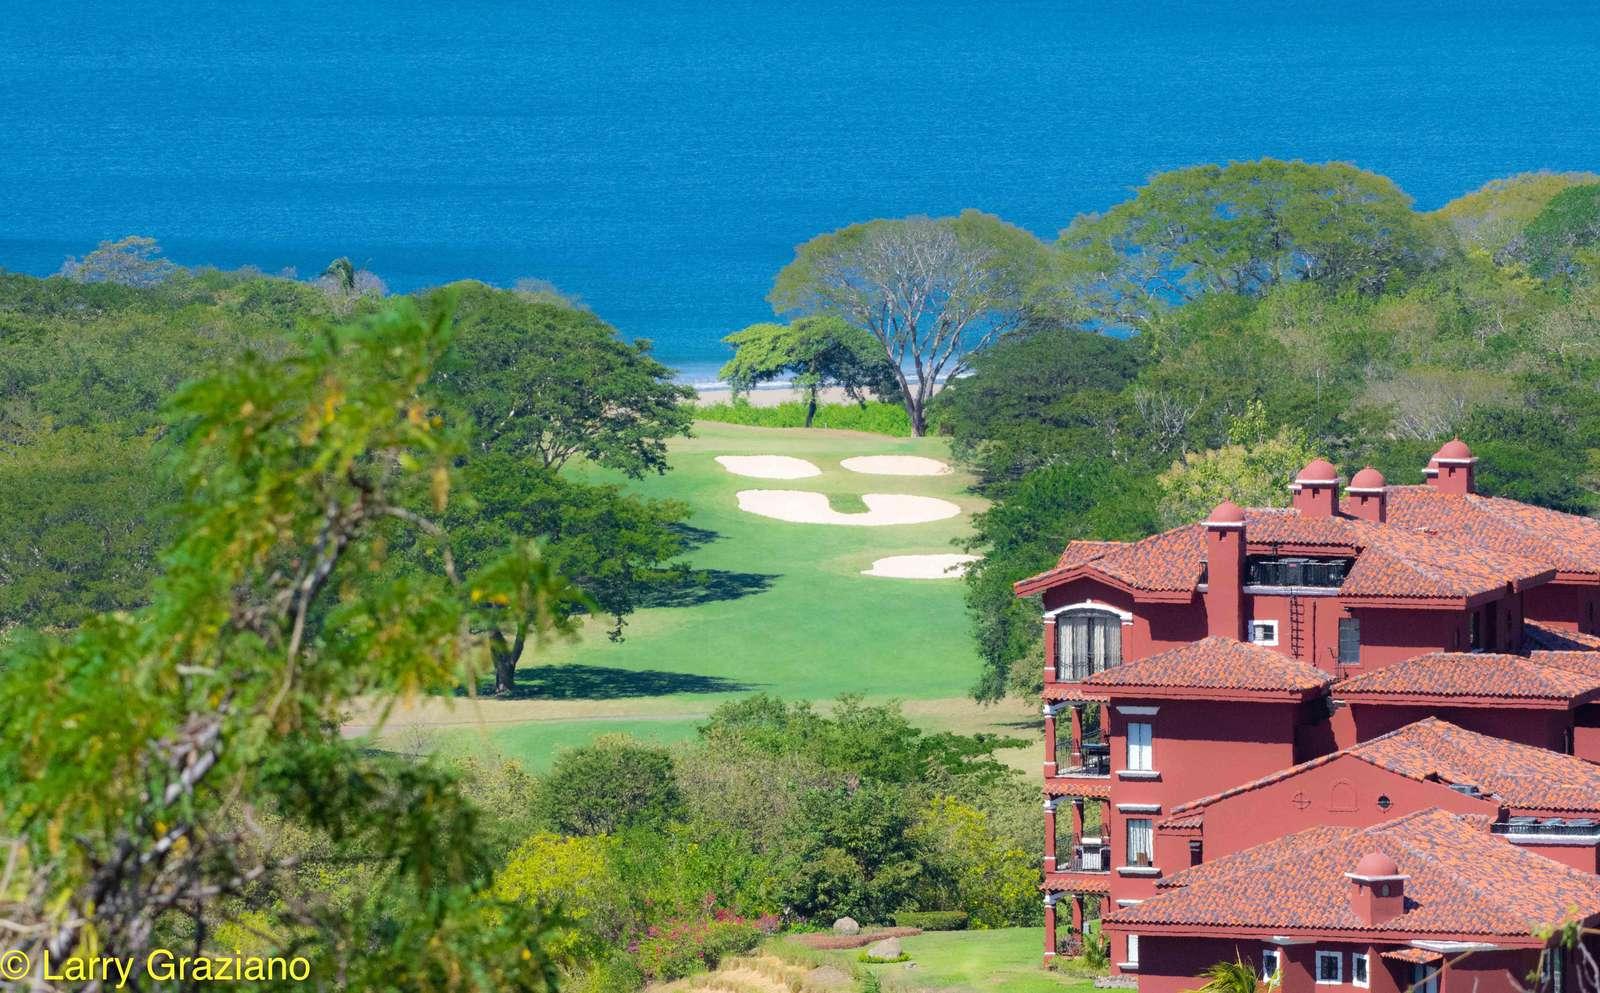 Bougainvillea 4315, a luxury 3 Bedroom Ocean View penthouse condo at Reserva conchal